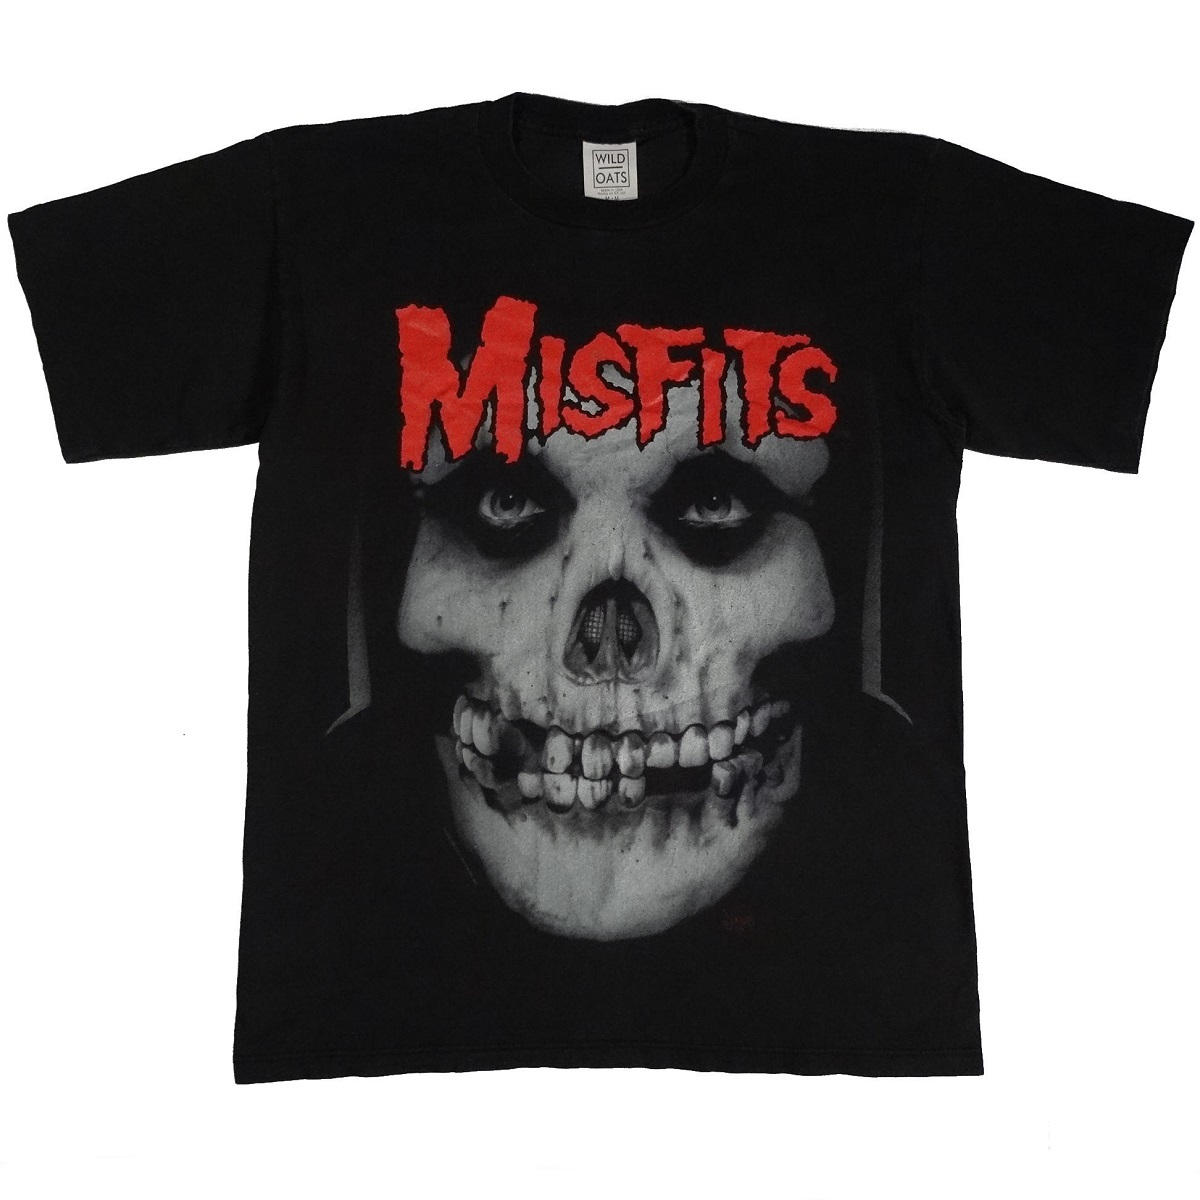 misfits band concert tour vintage 90s t shirt front of shirt